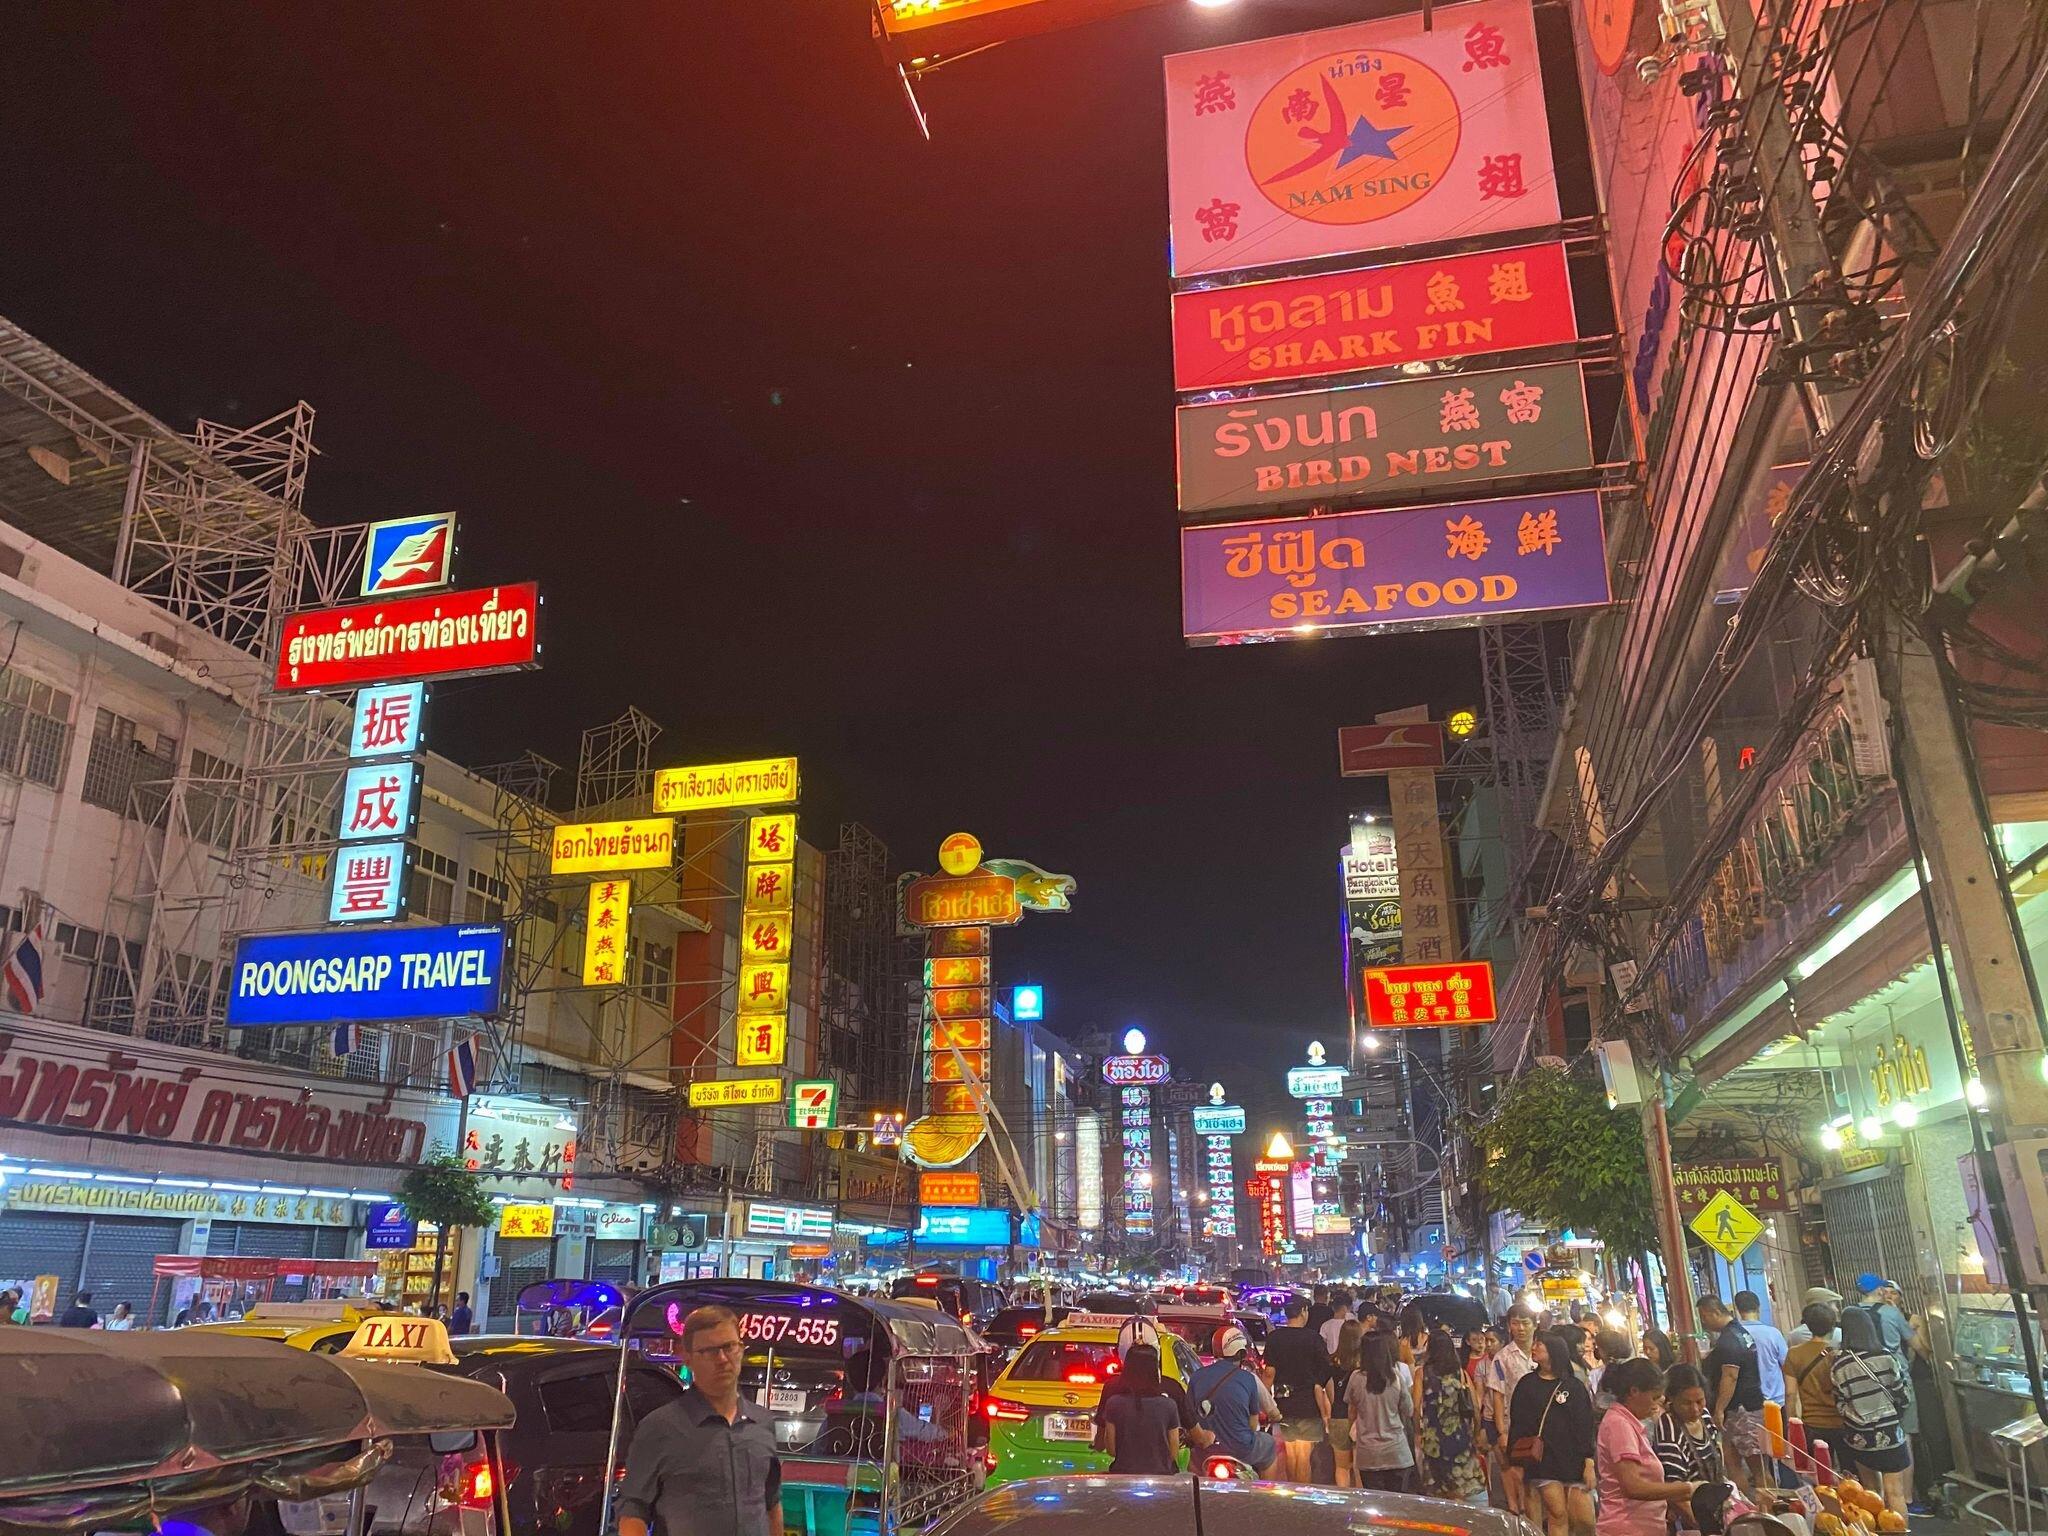 Yaowarat Road, also known as Chinatown in Bangkok